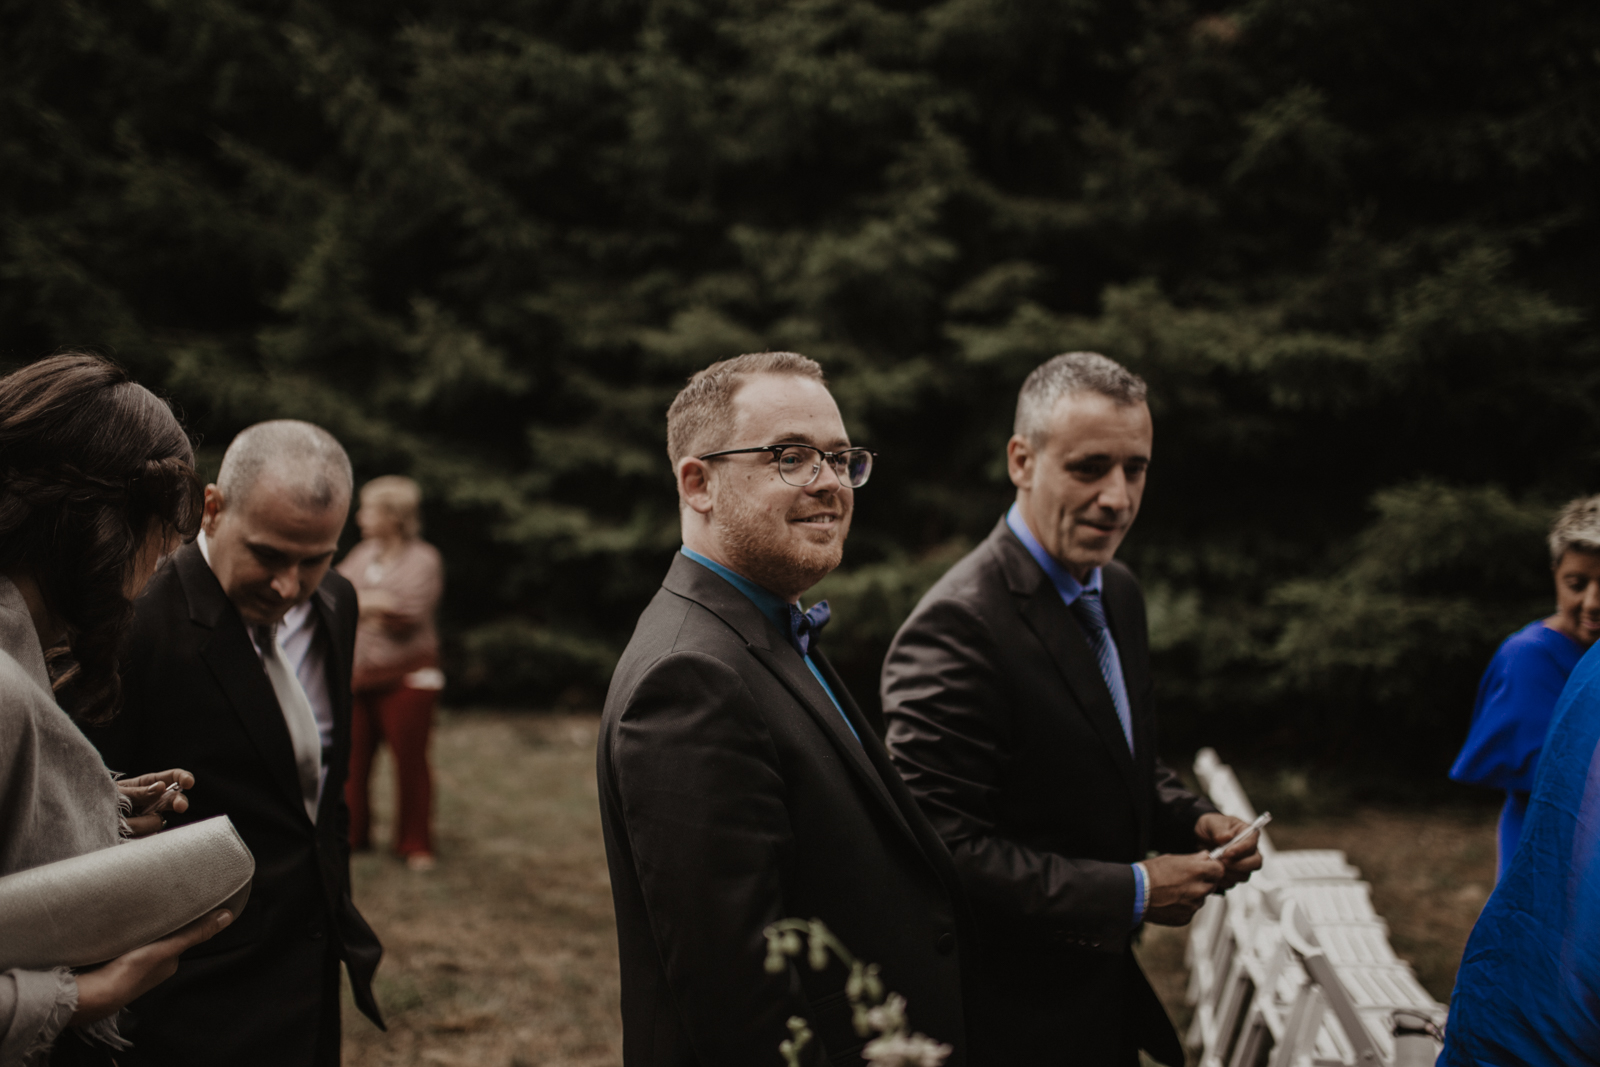 thenortherngirlphotography_photography_thenortherngirl_rebeccascabros_wedding_weddingphotography_weddingphotographer_barcelona_bodaenbarcelona_bodaenmaselmarti_bodarogeryvane-319.jpg